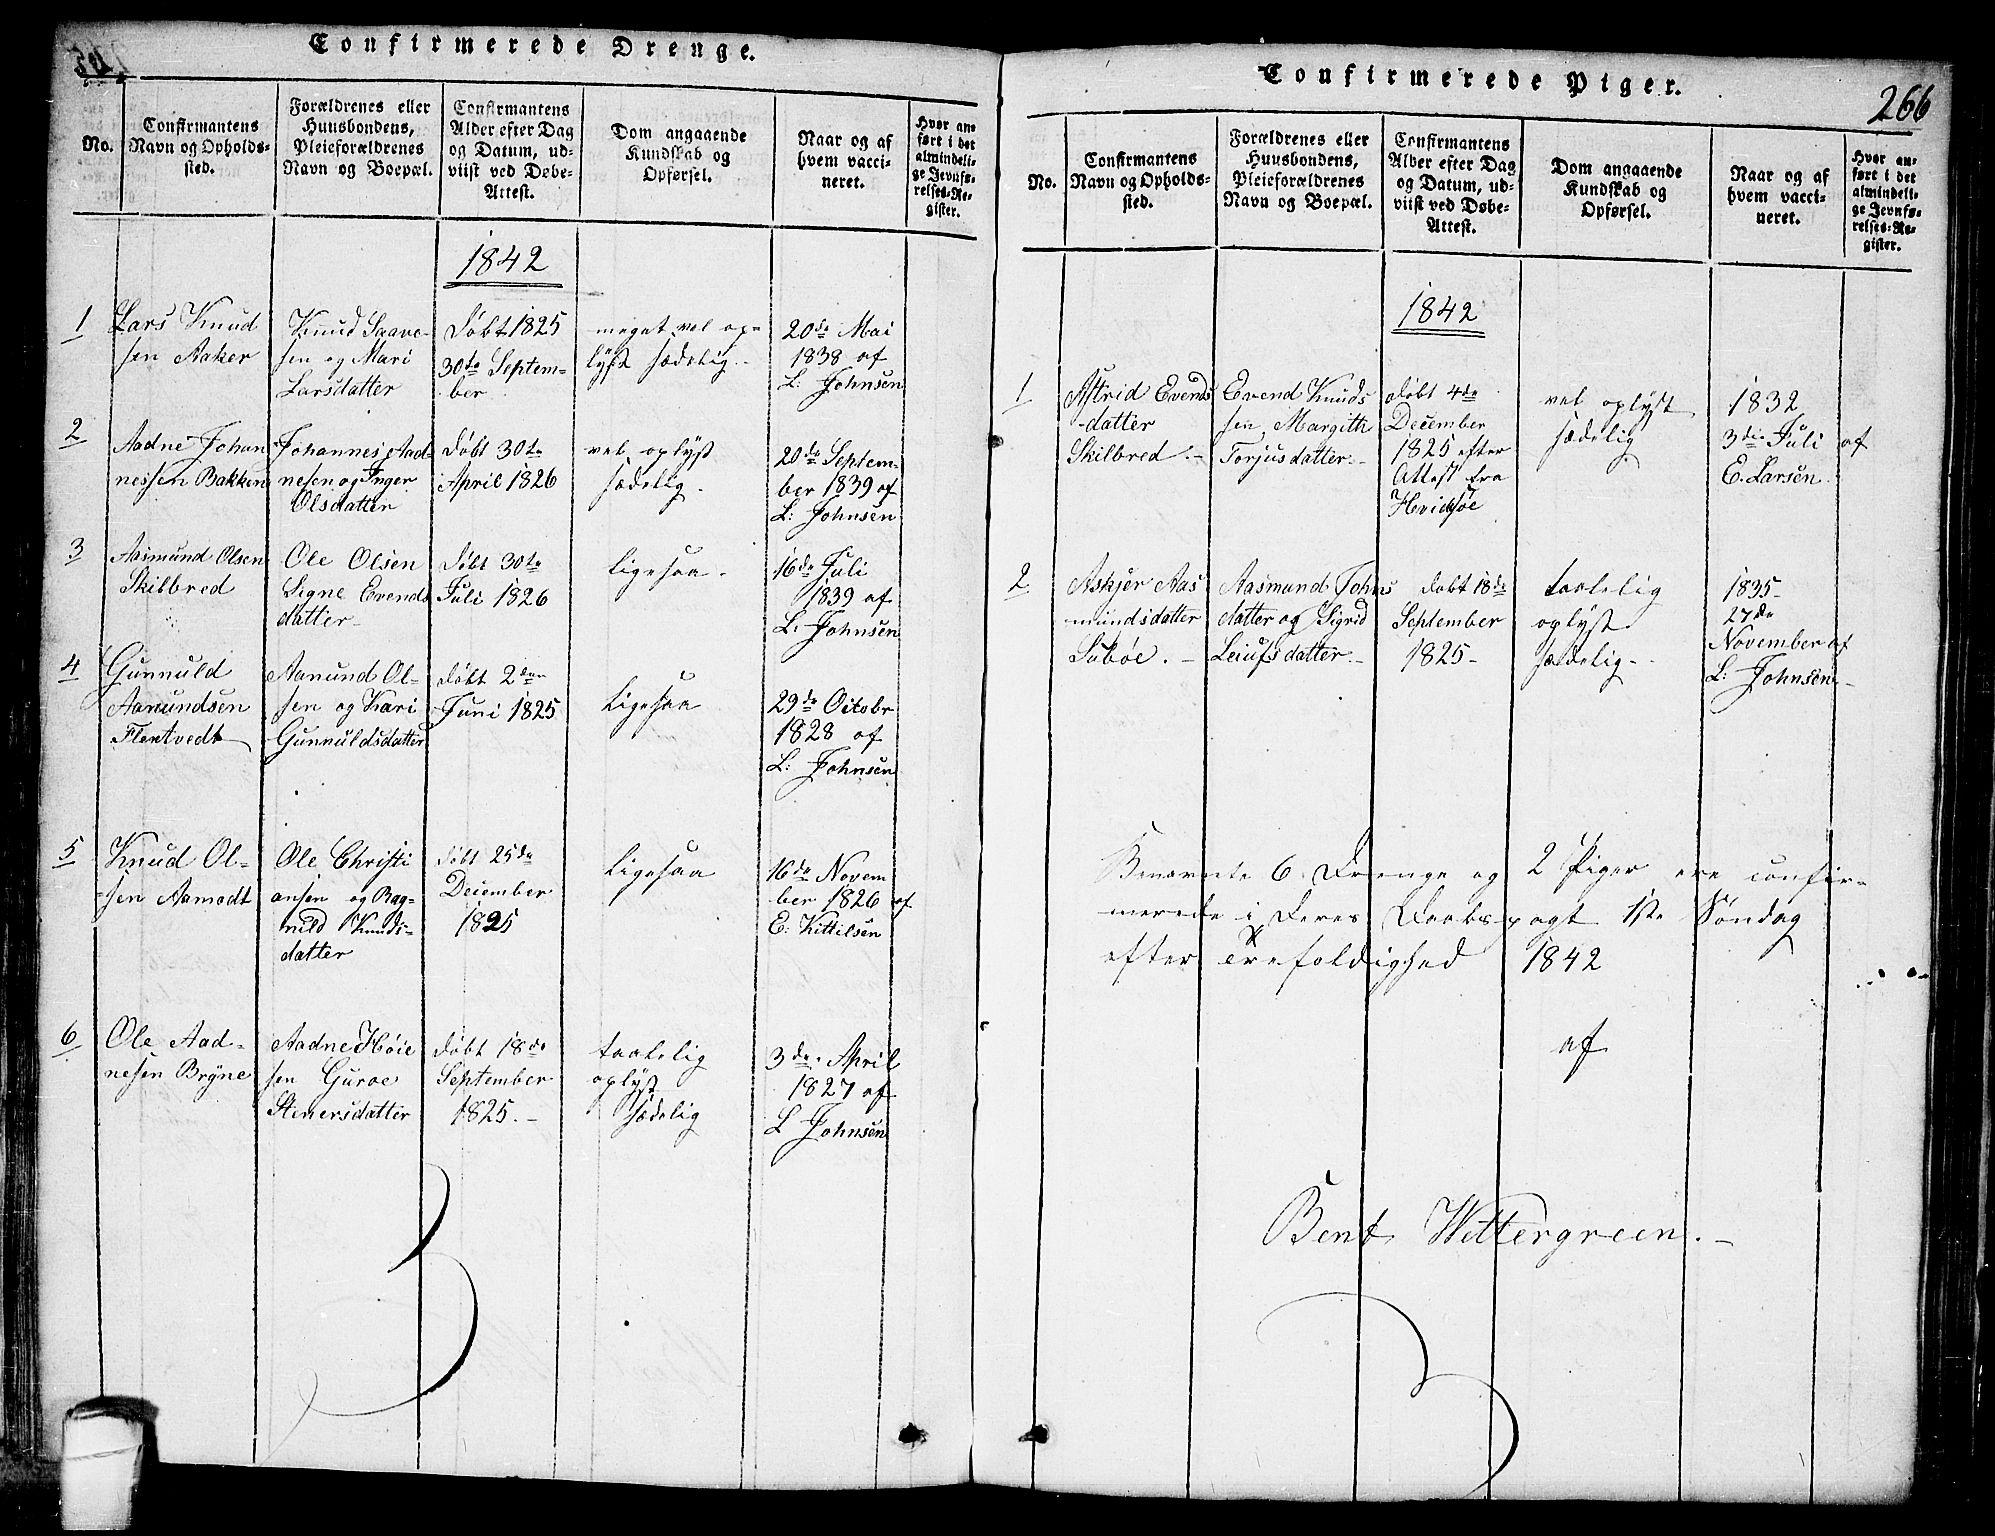 SAKO, Lårdal kirkebøker, G/Ga/L0001: Klokkerbok nr. I 1, 1815-1861, s. 266